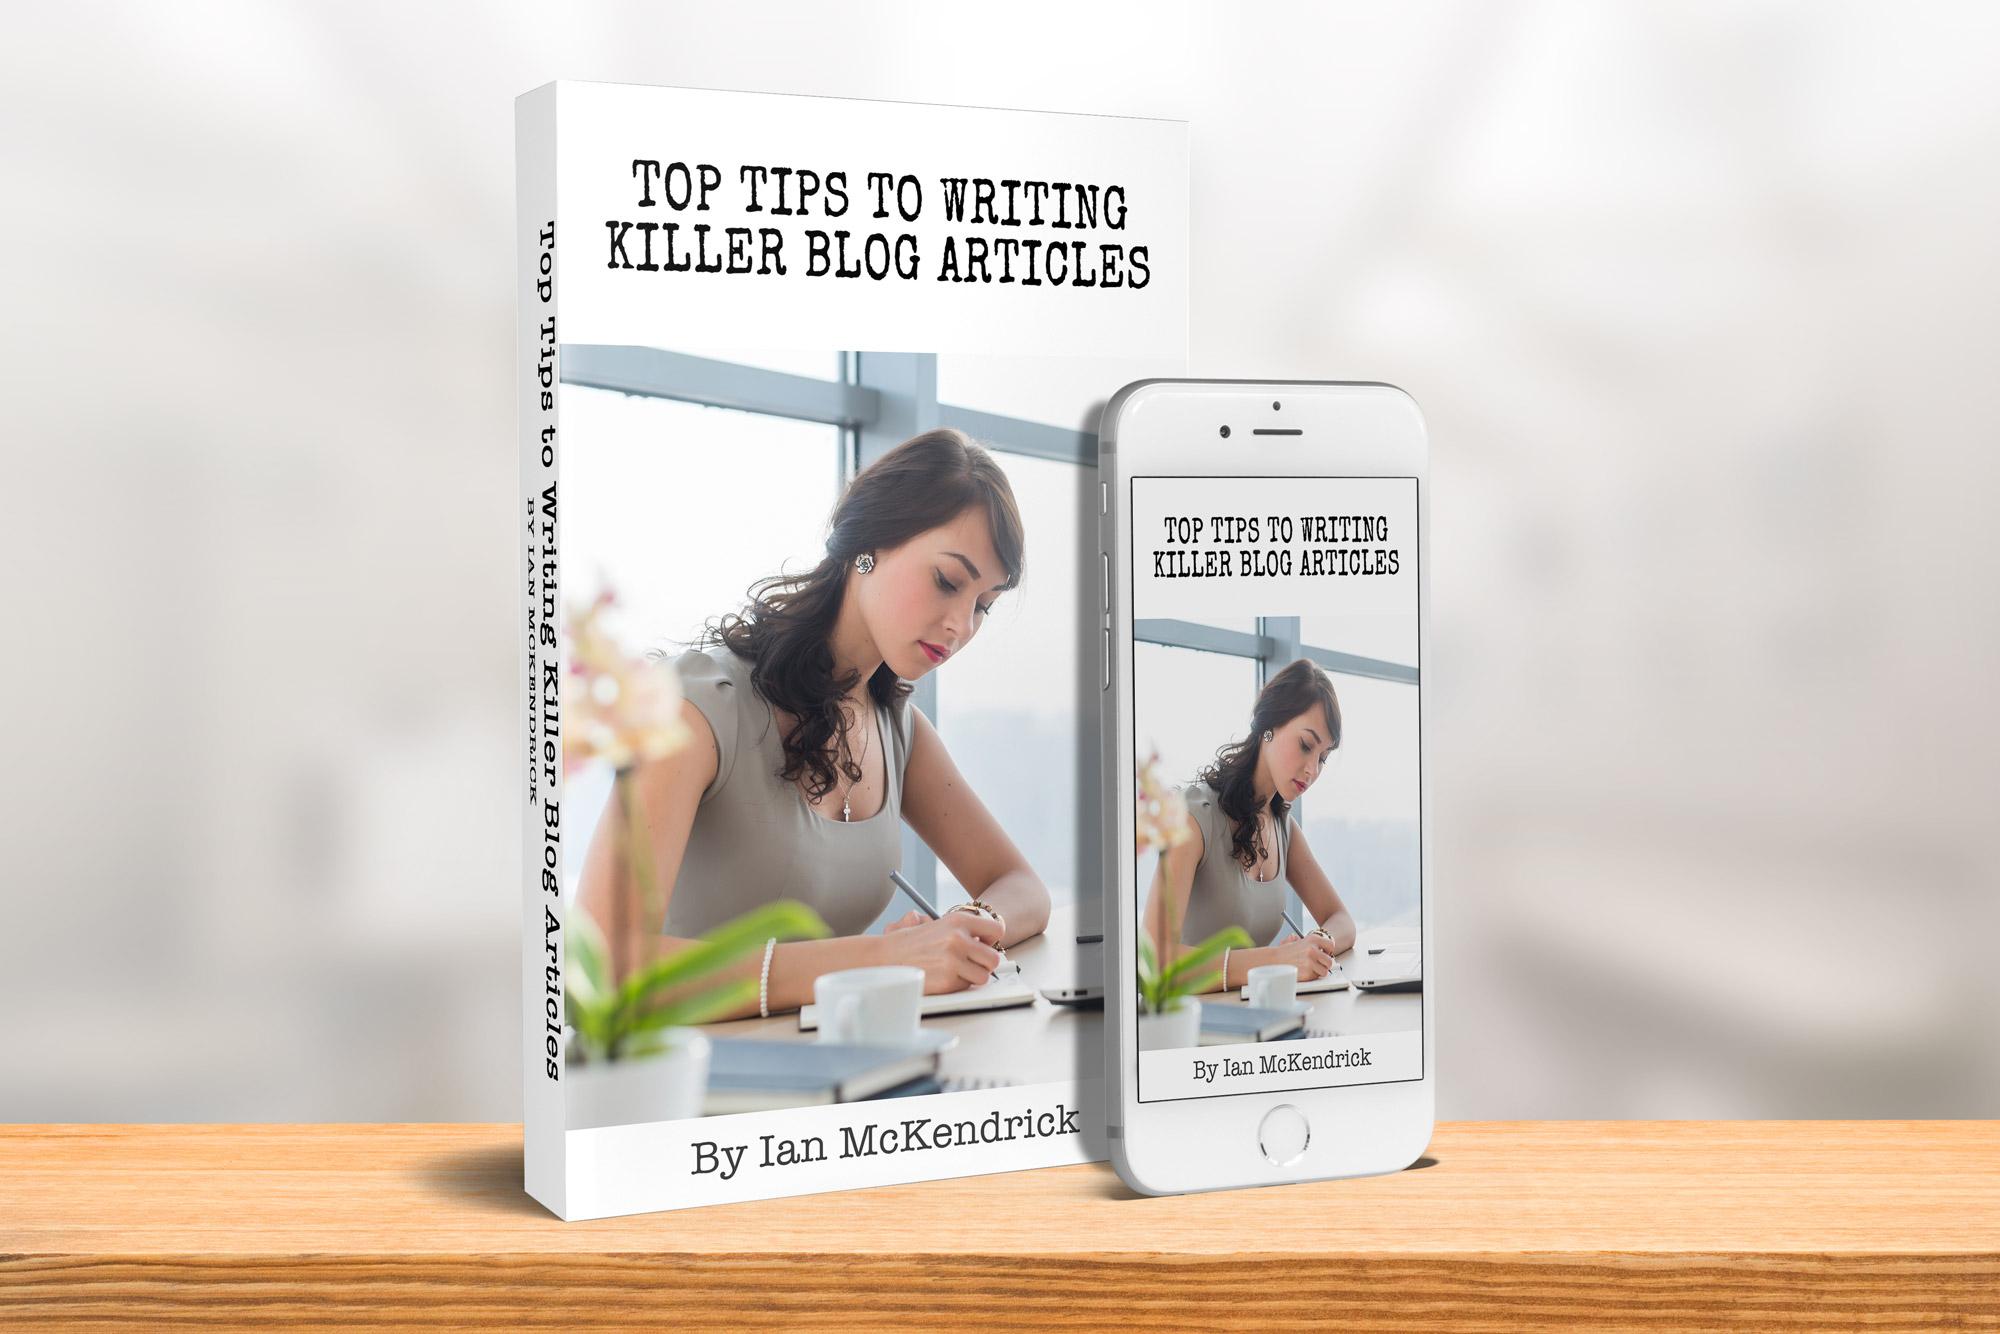 Top Tips To Writing Killer Blog Articles